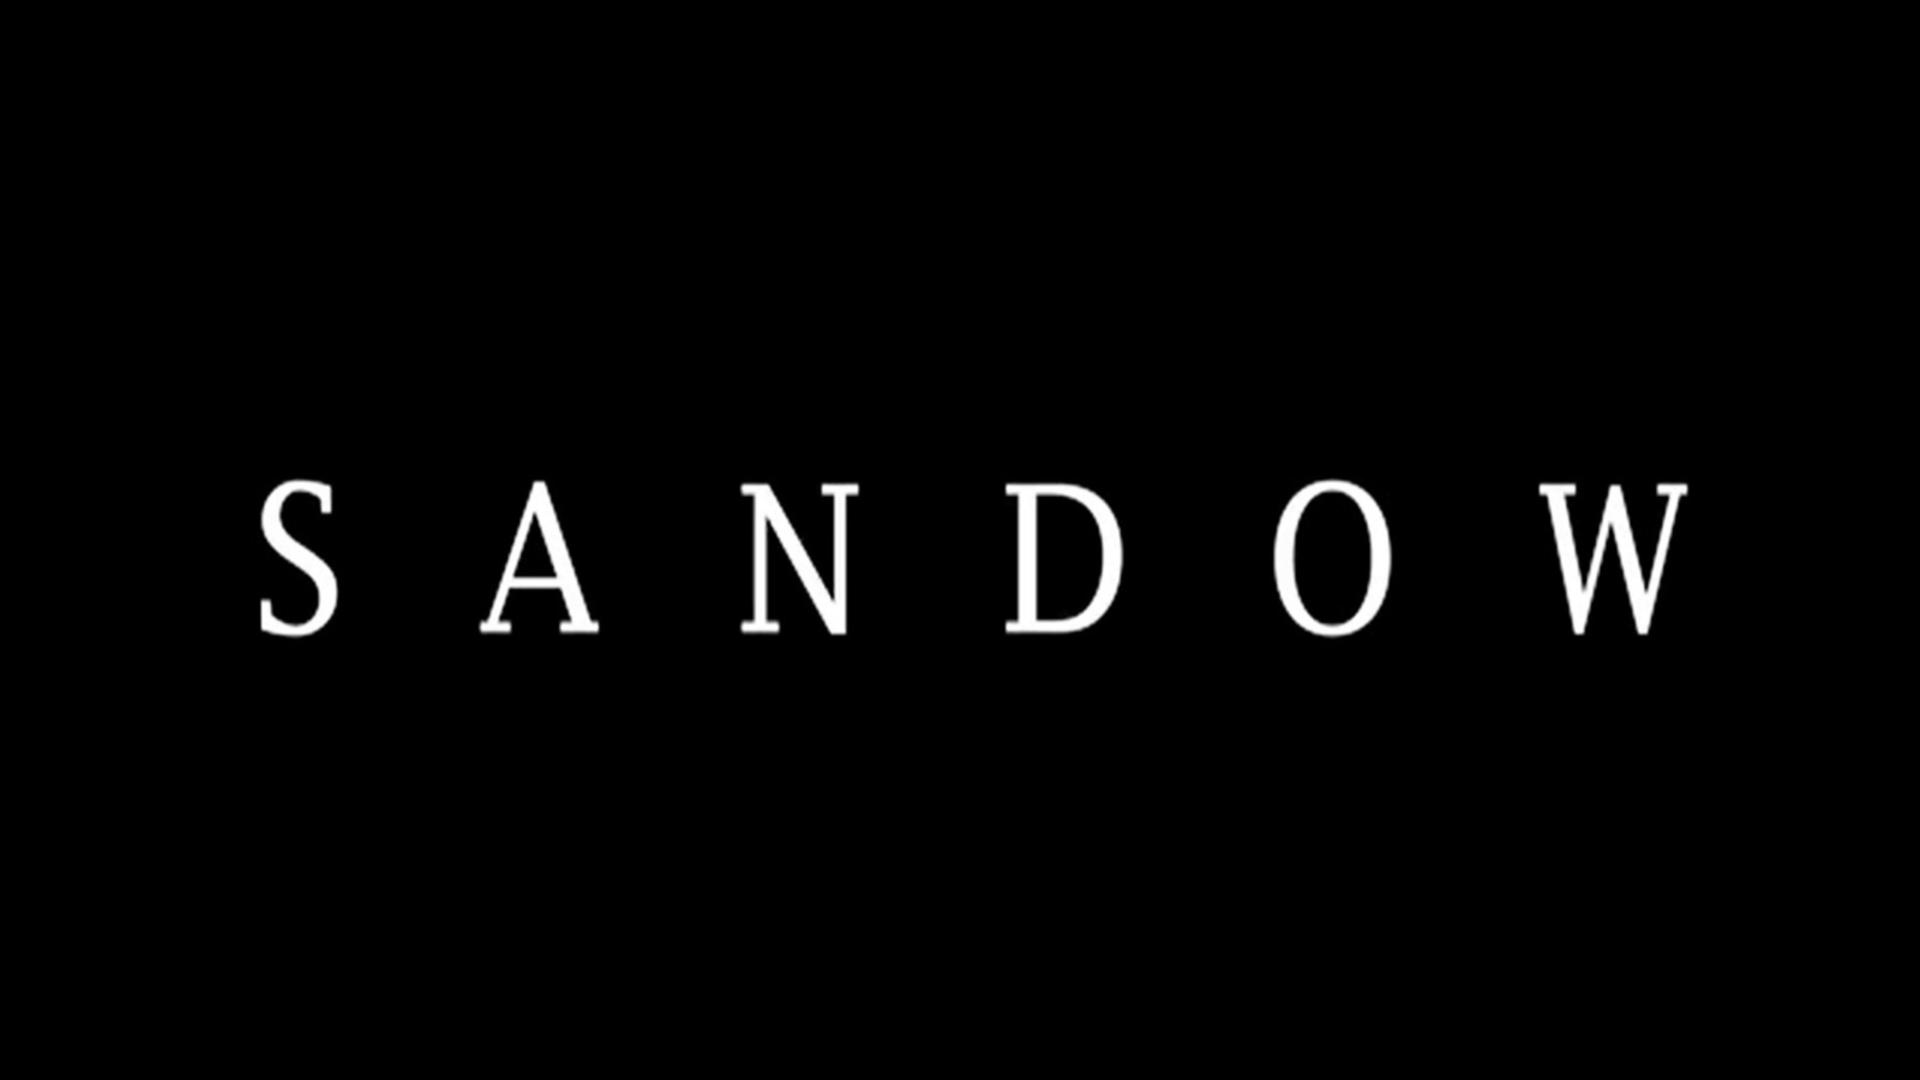 Sandow amazon